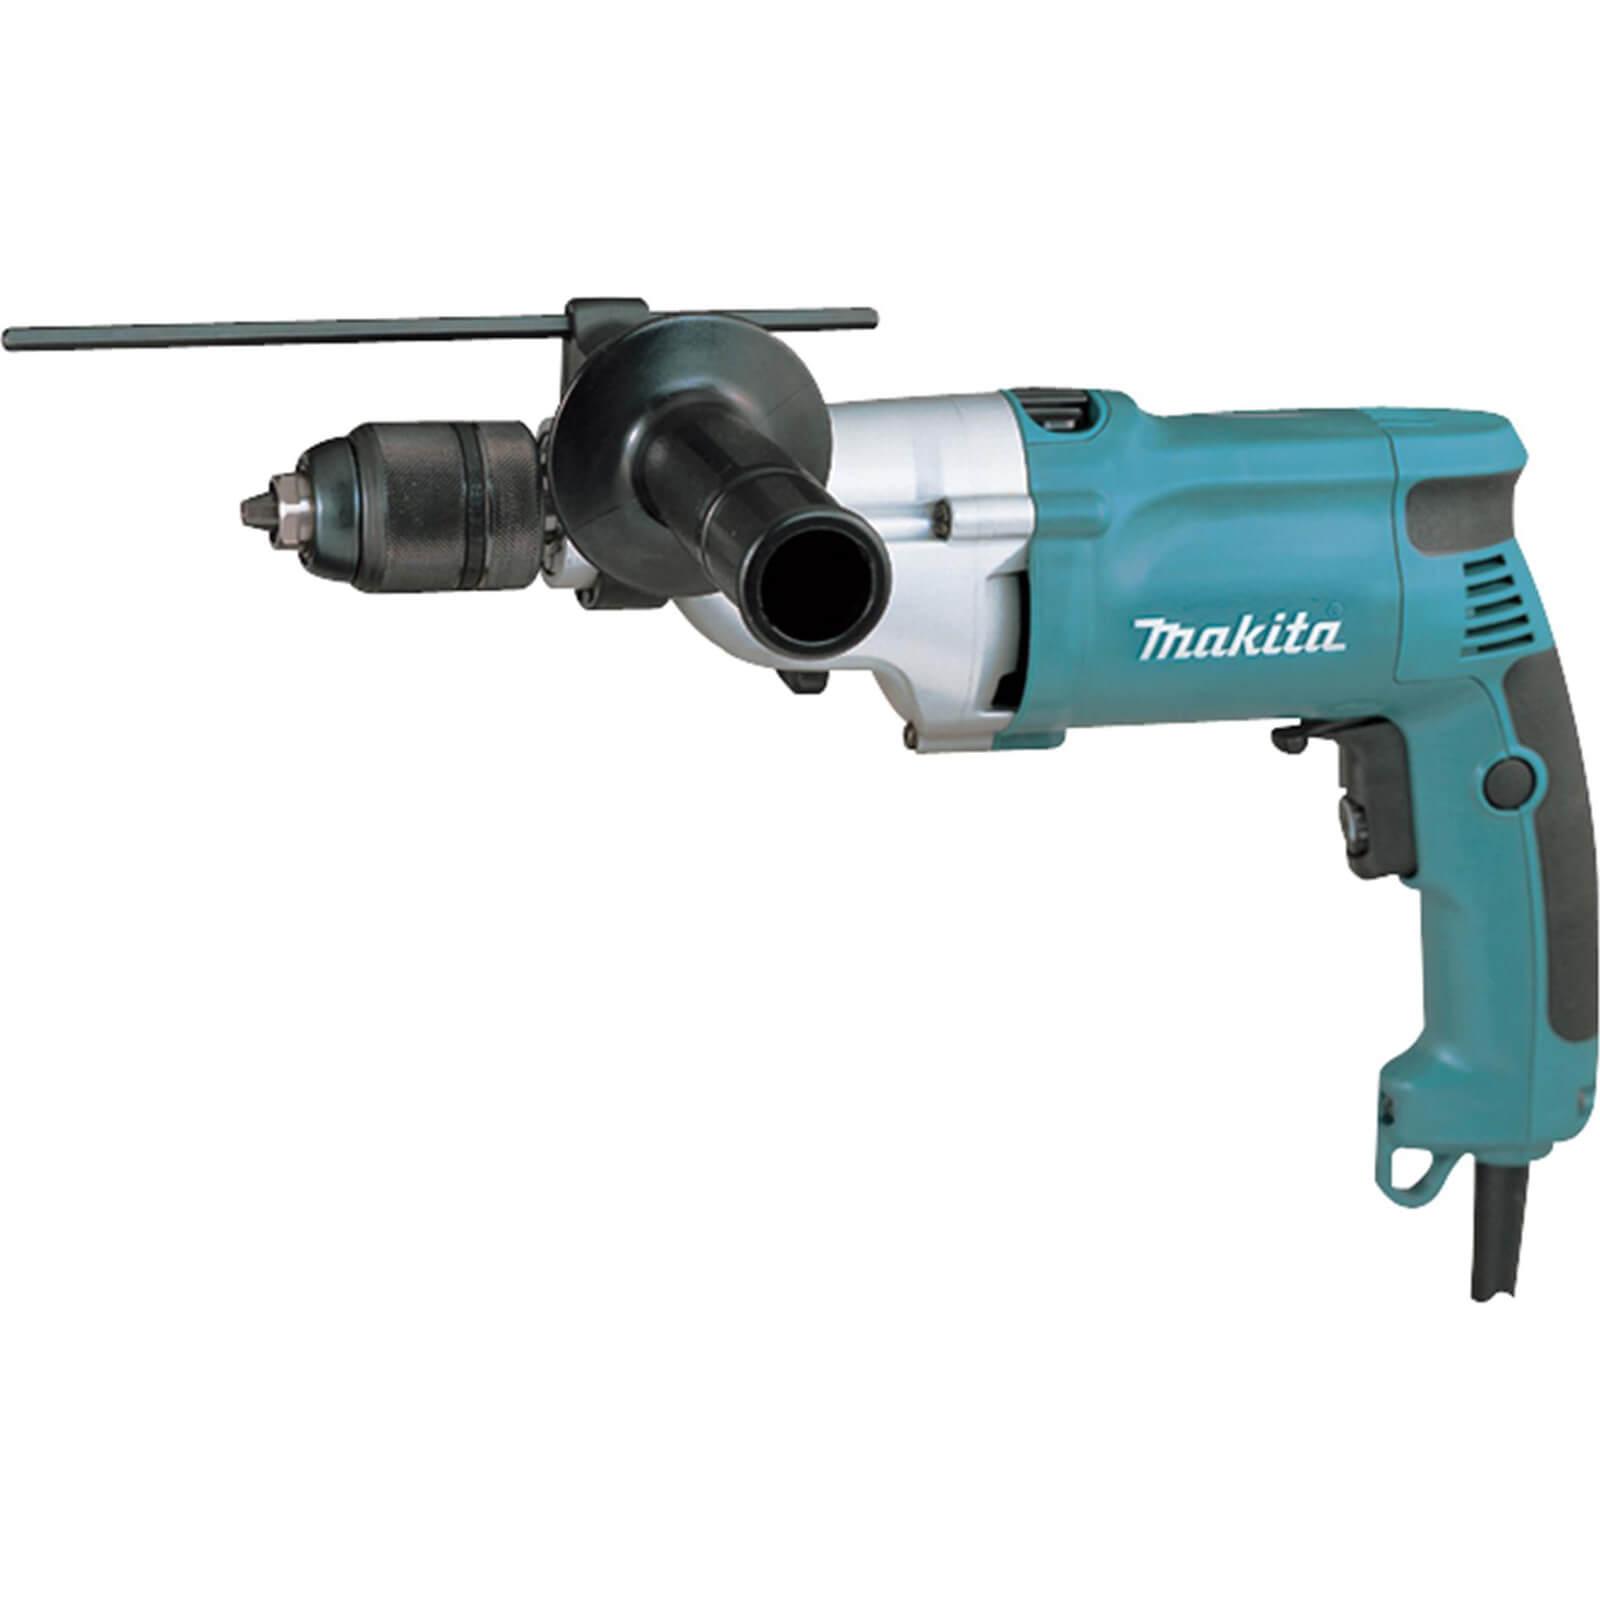 Image of Makita HP2051 Hammer Drill 240v